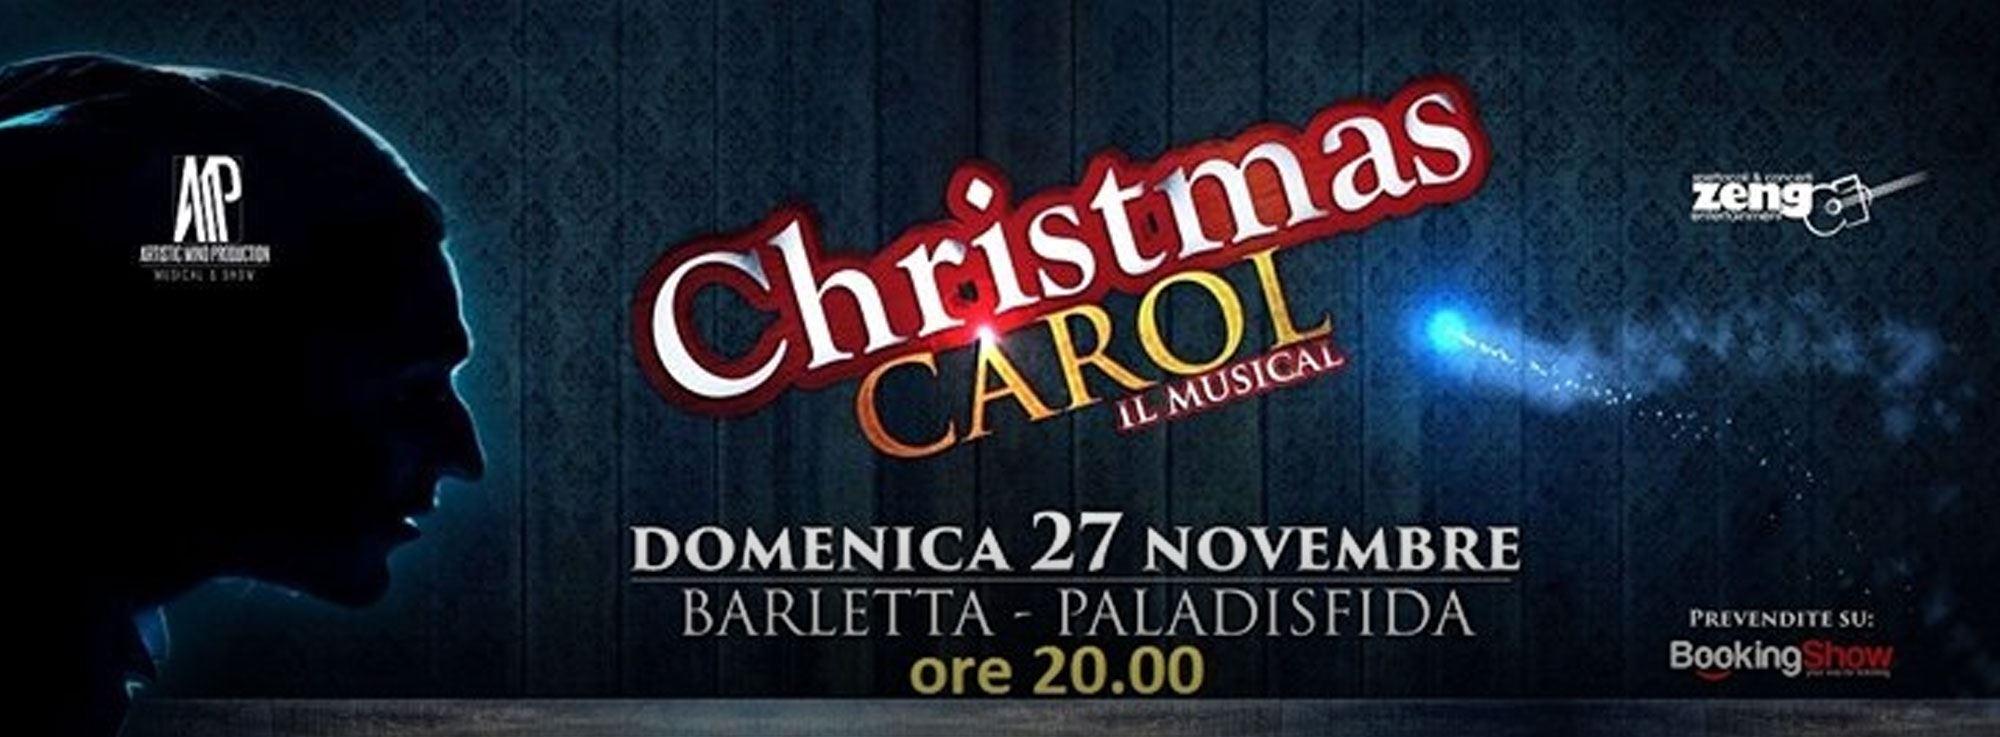 Barletta: Christmas Carol il musical